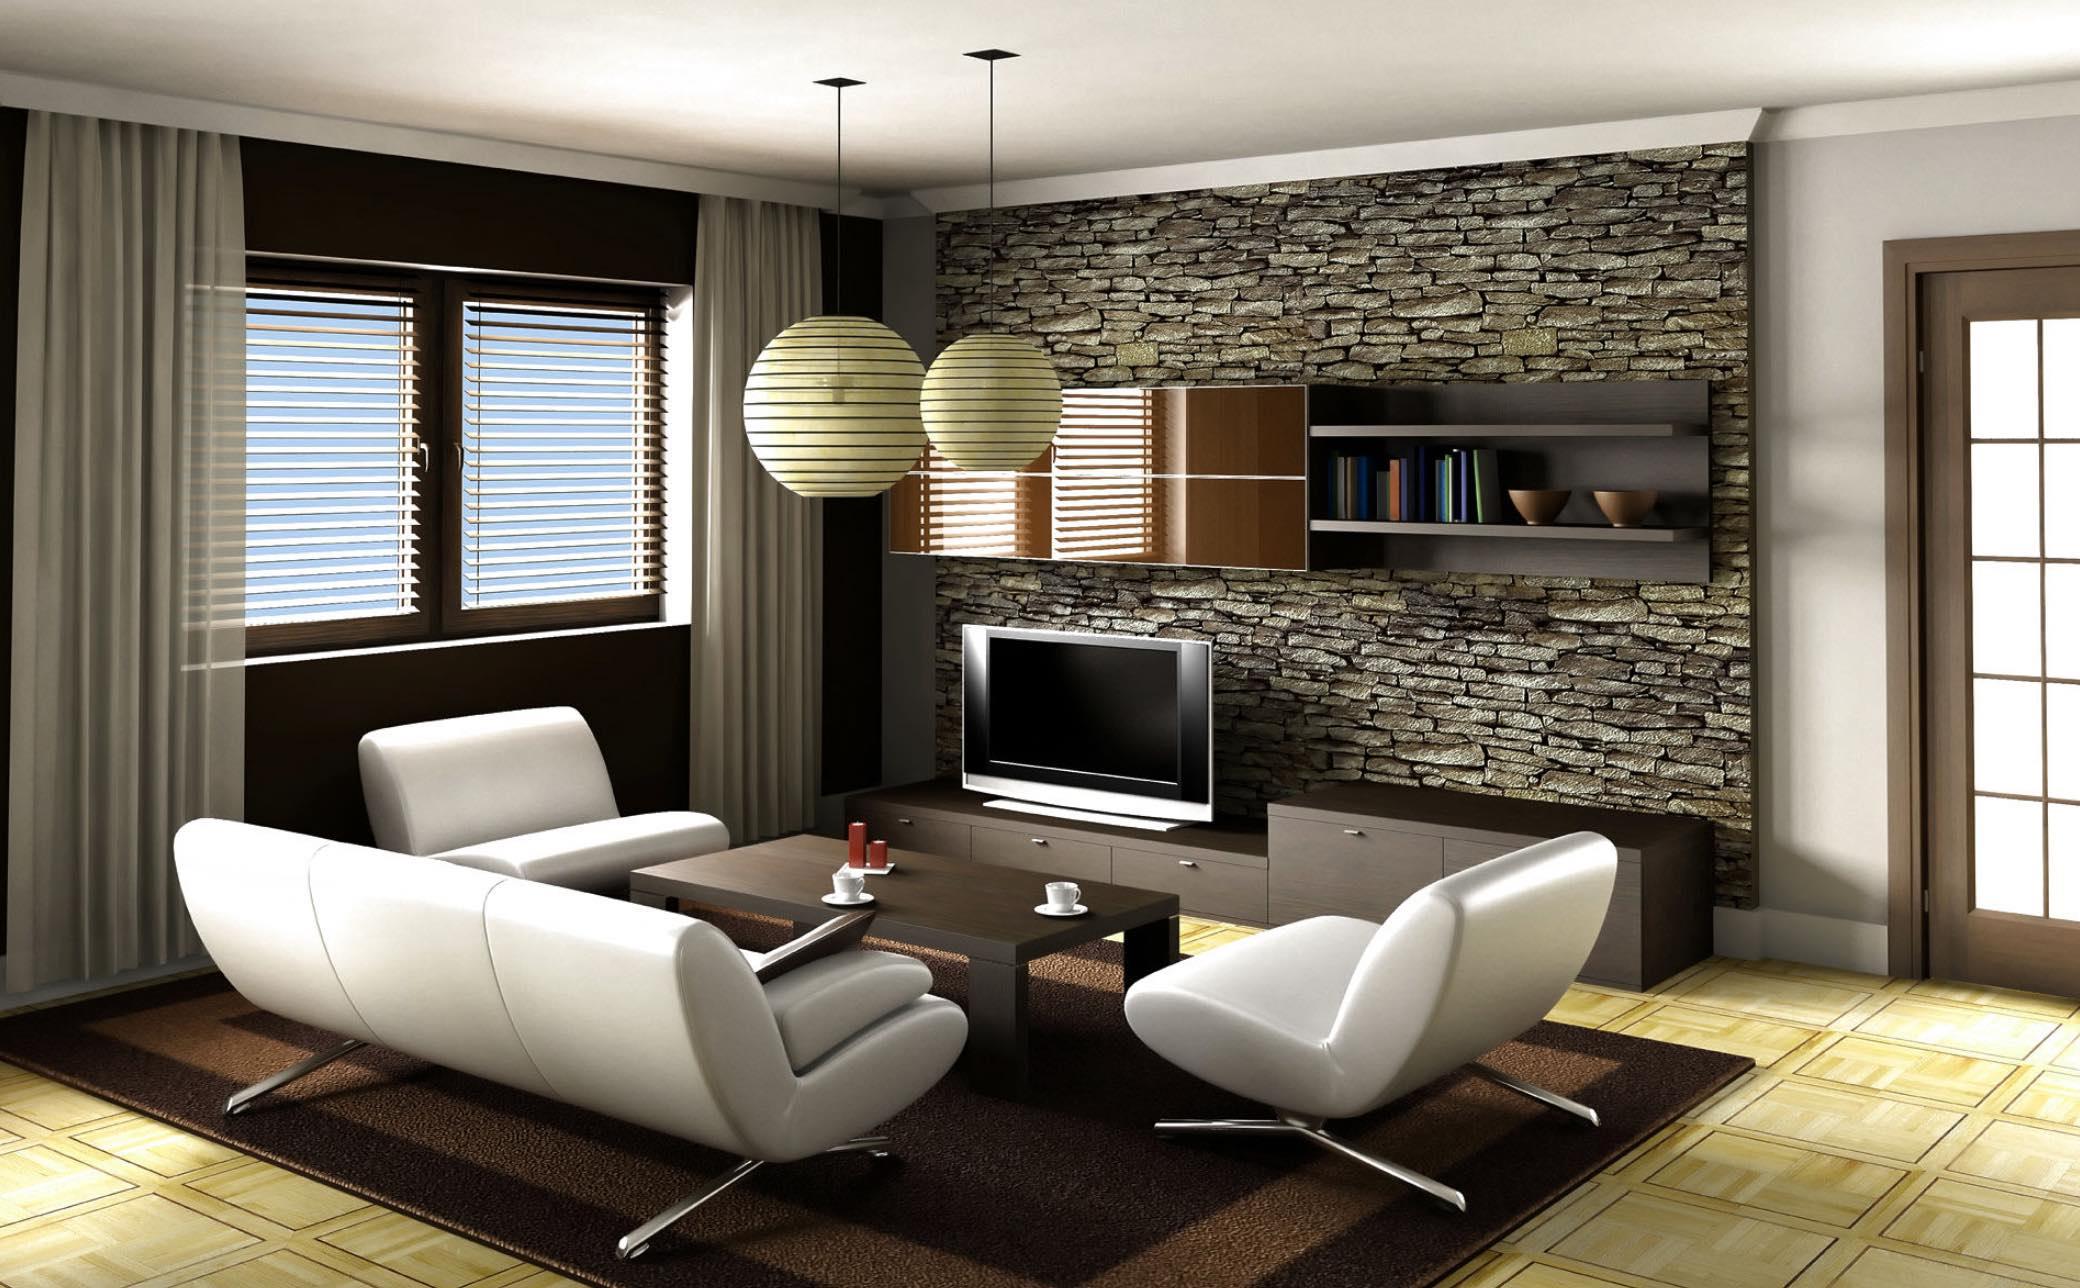 The ABCs of Effective Interior Design